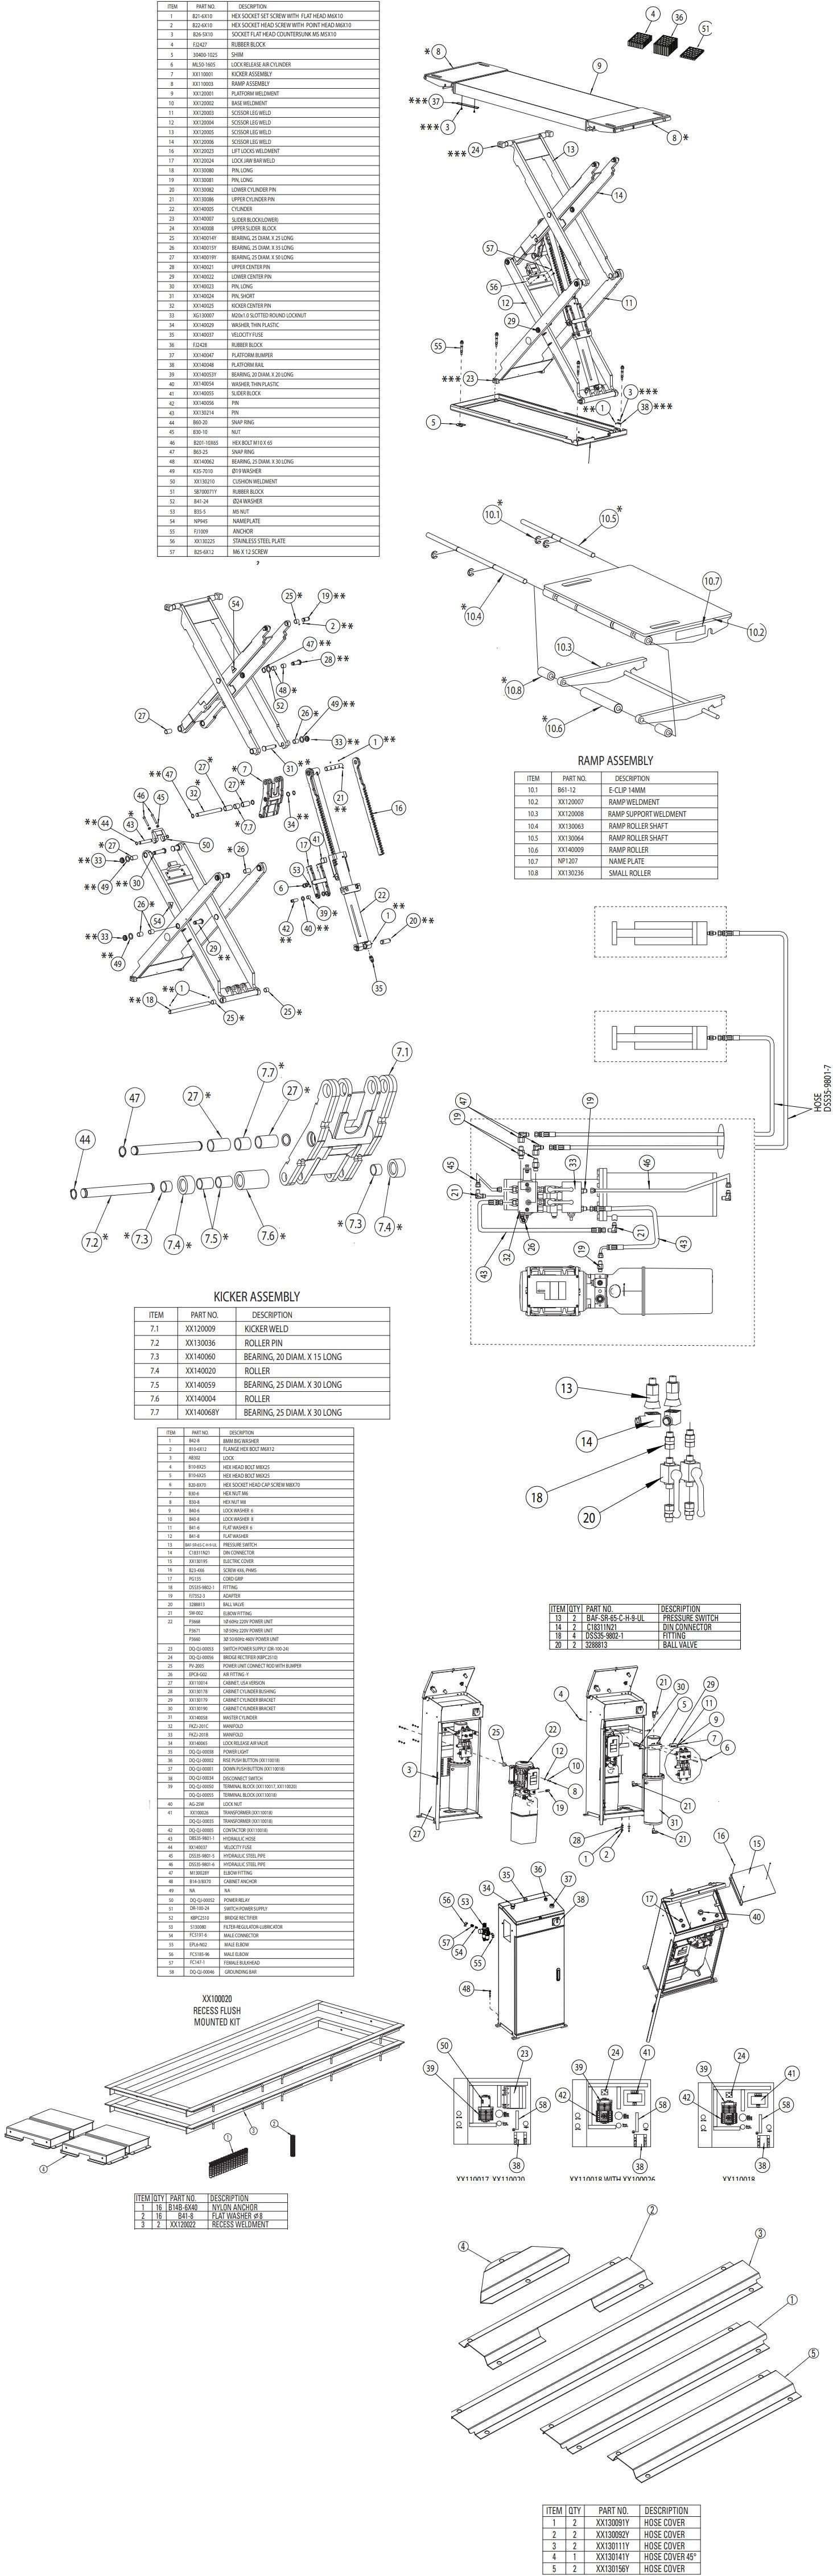 Forward FS77 Double Scissor Parts Manual